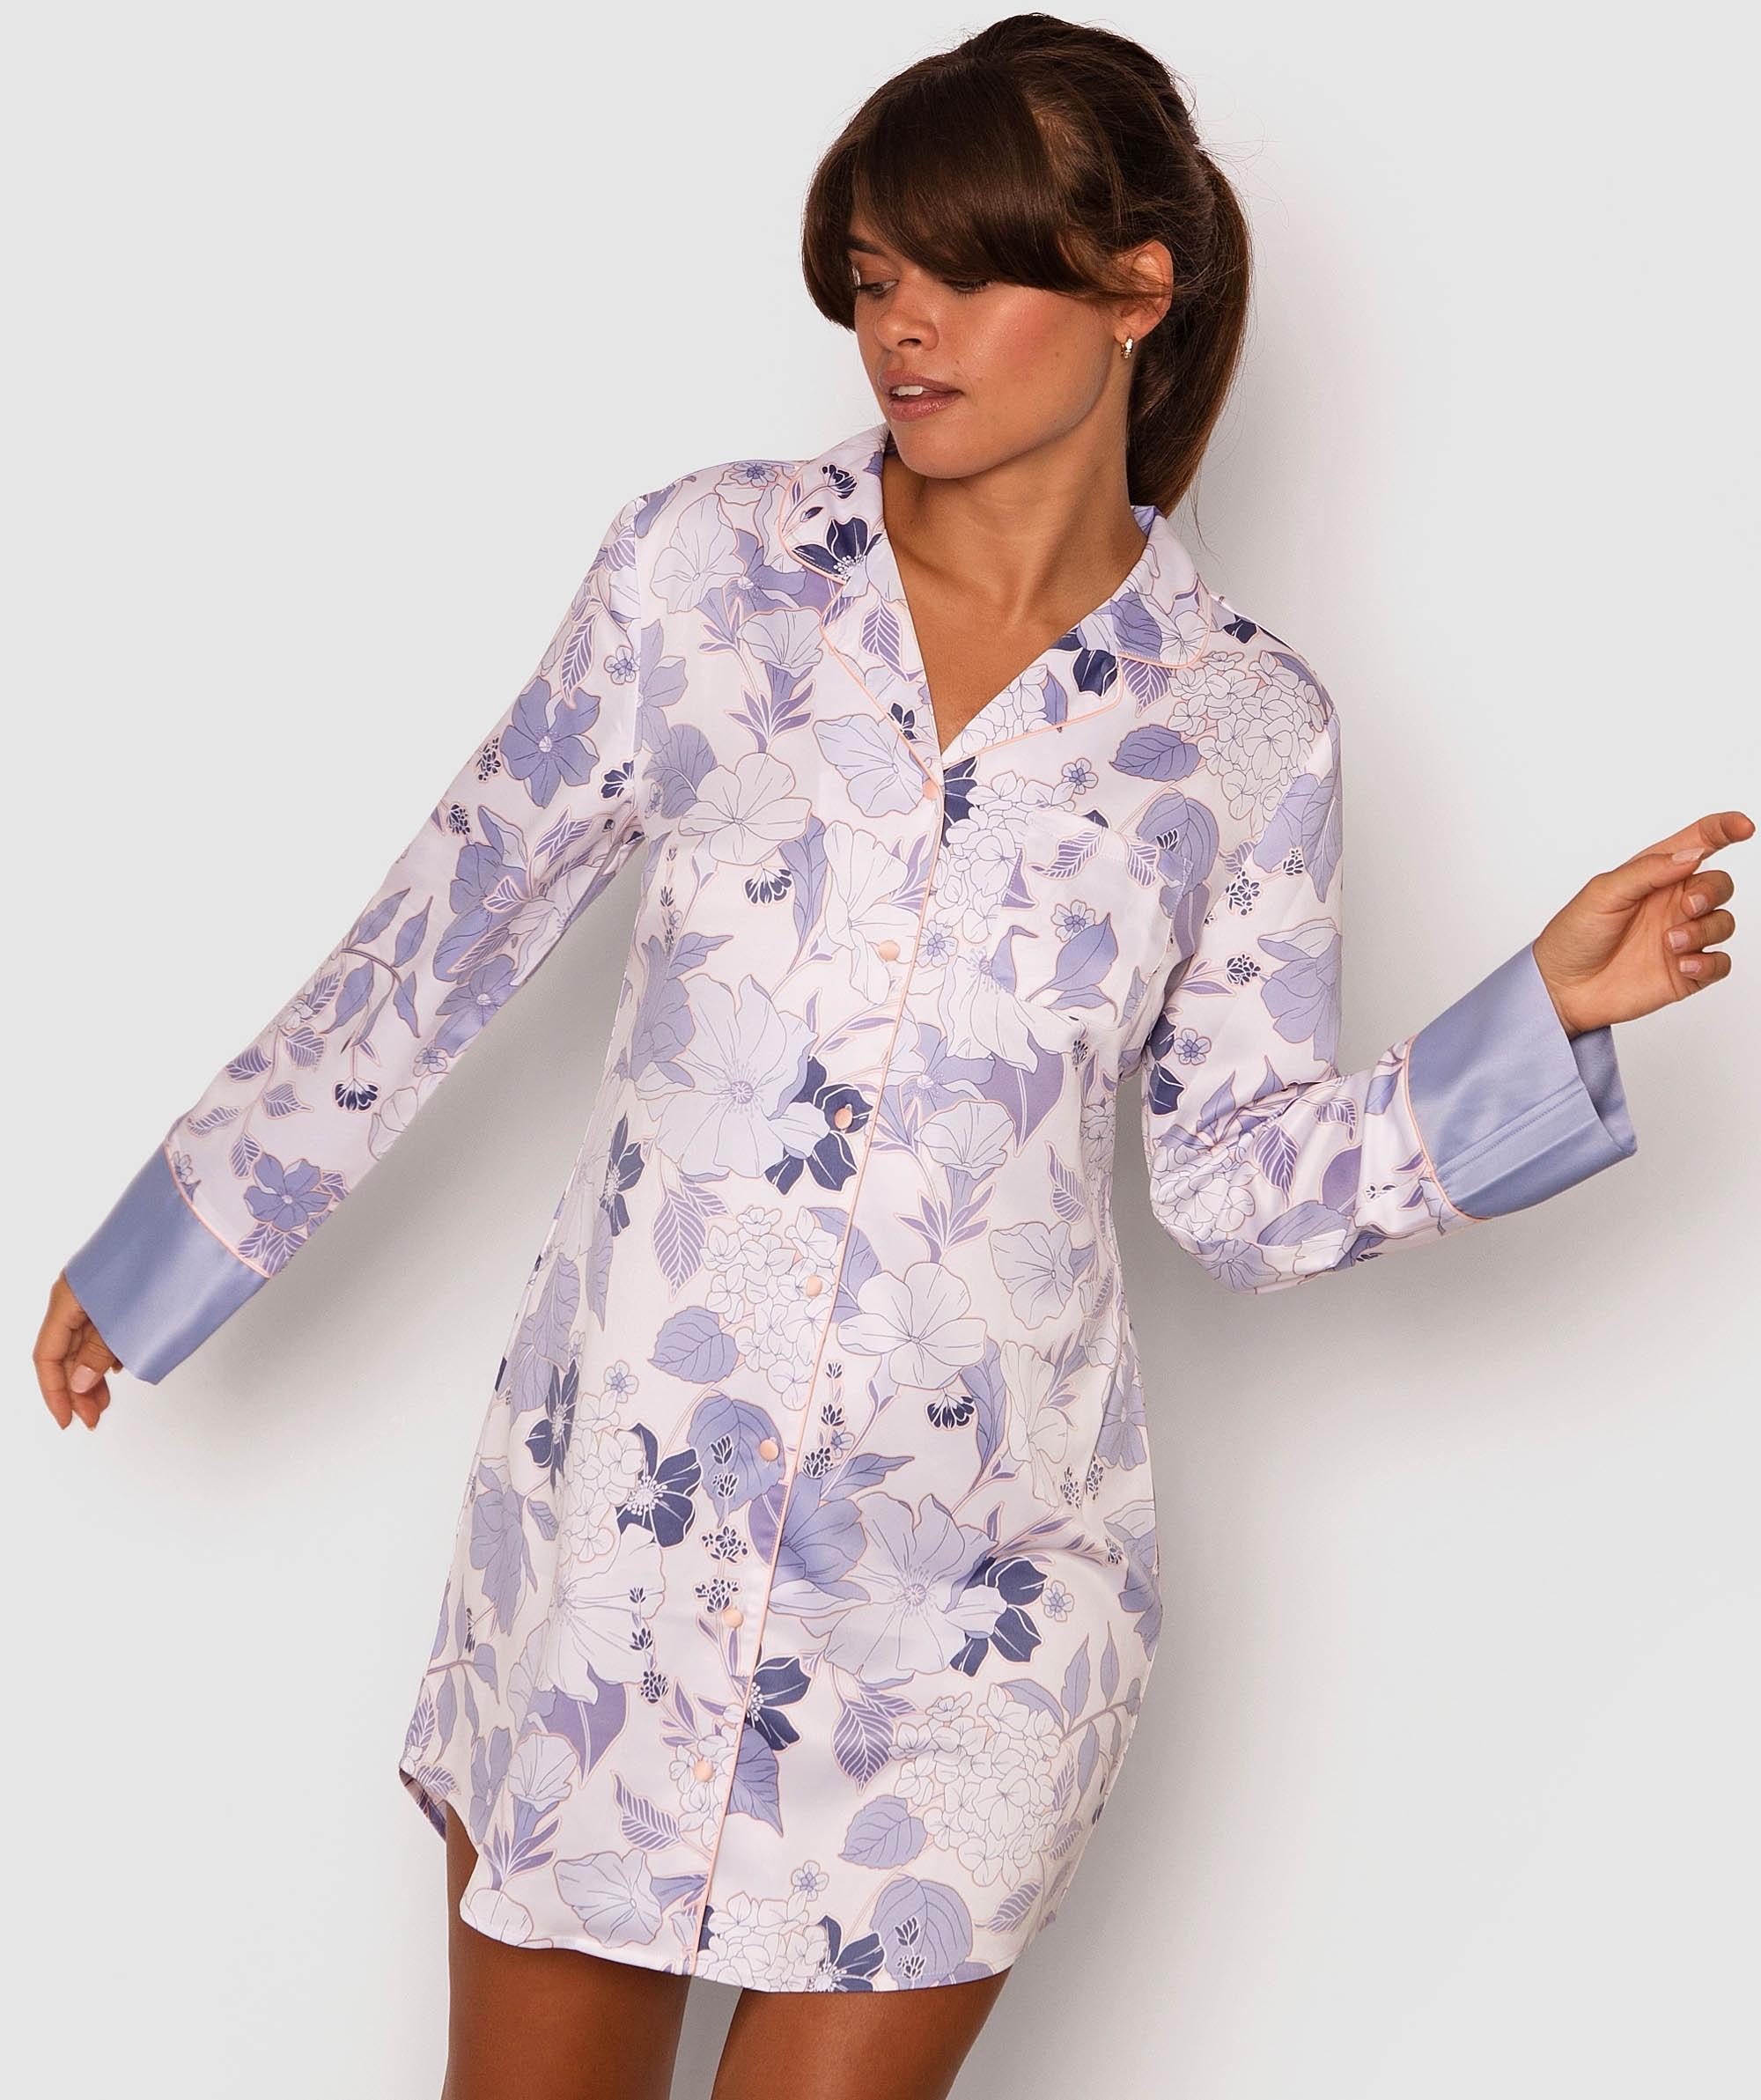 Bridgette Long Sleeve Sleep Shirt - Floral Print